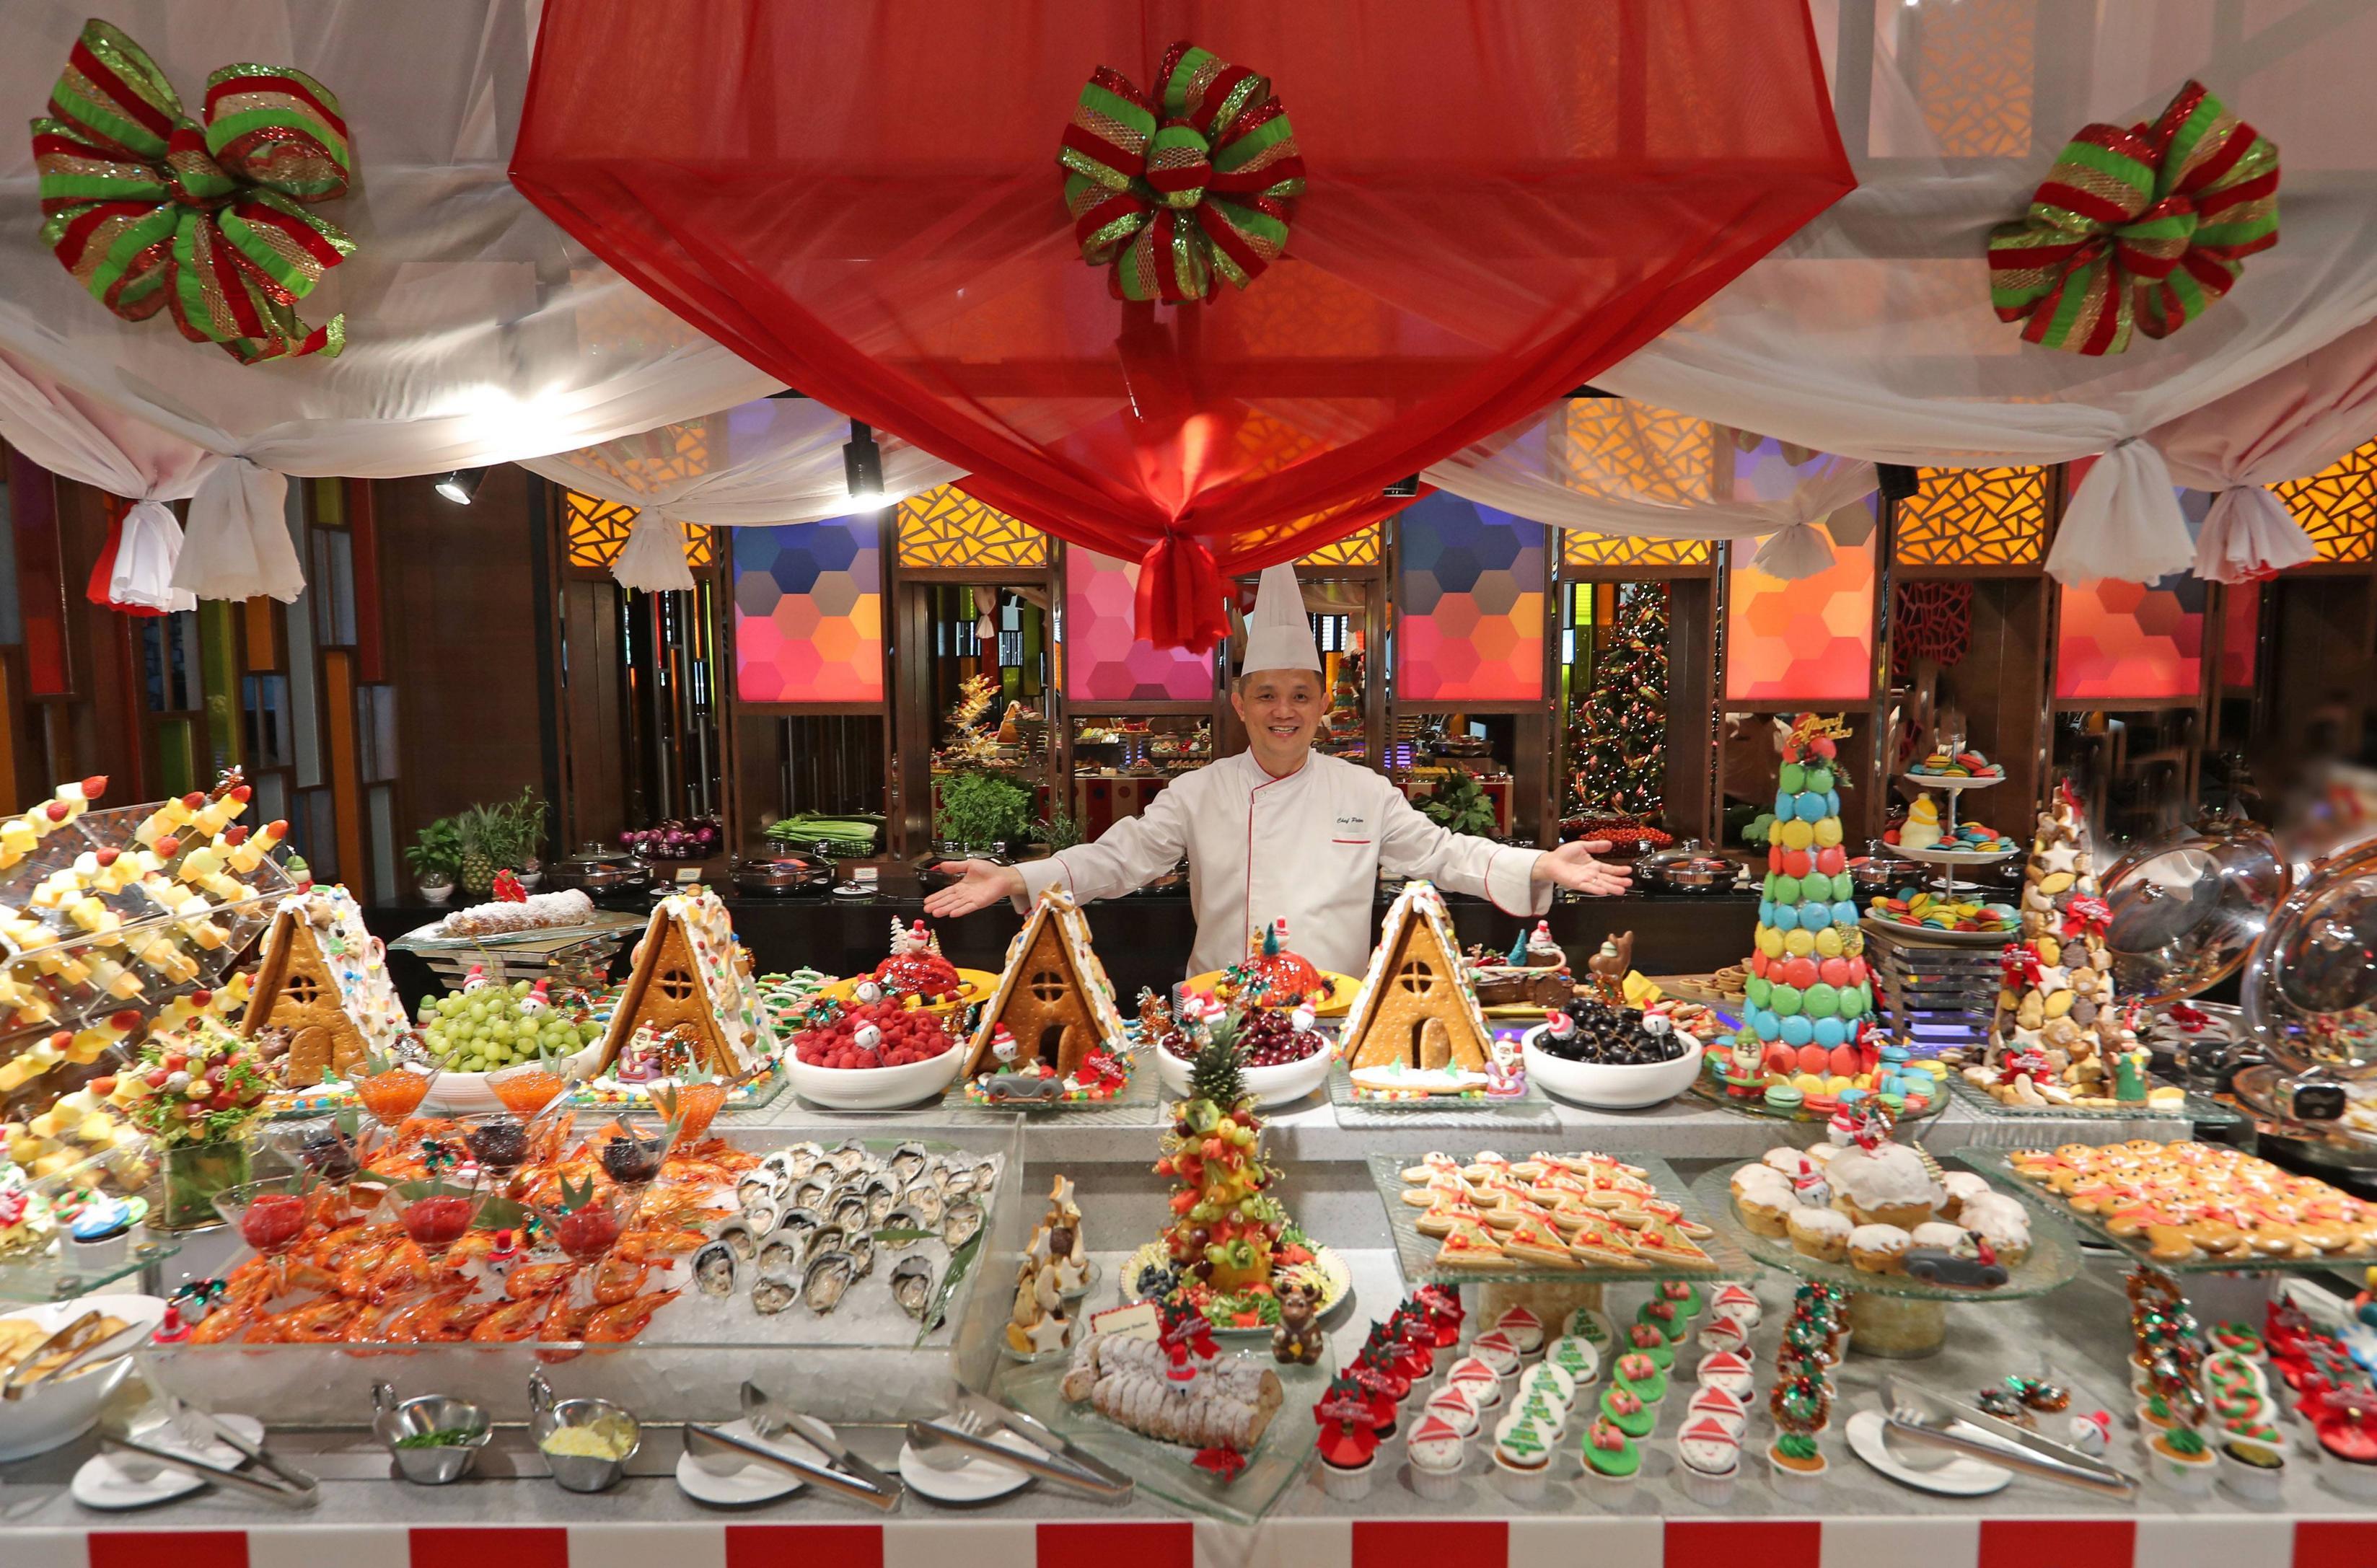 Image from Sunway Resort Hotel & Spa